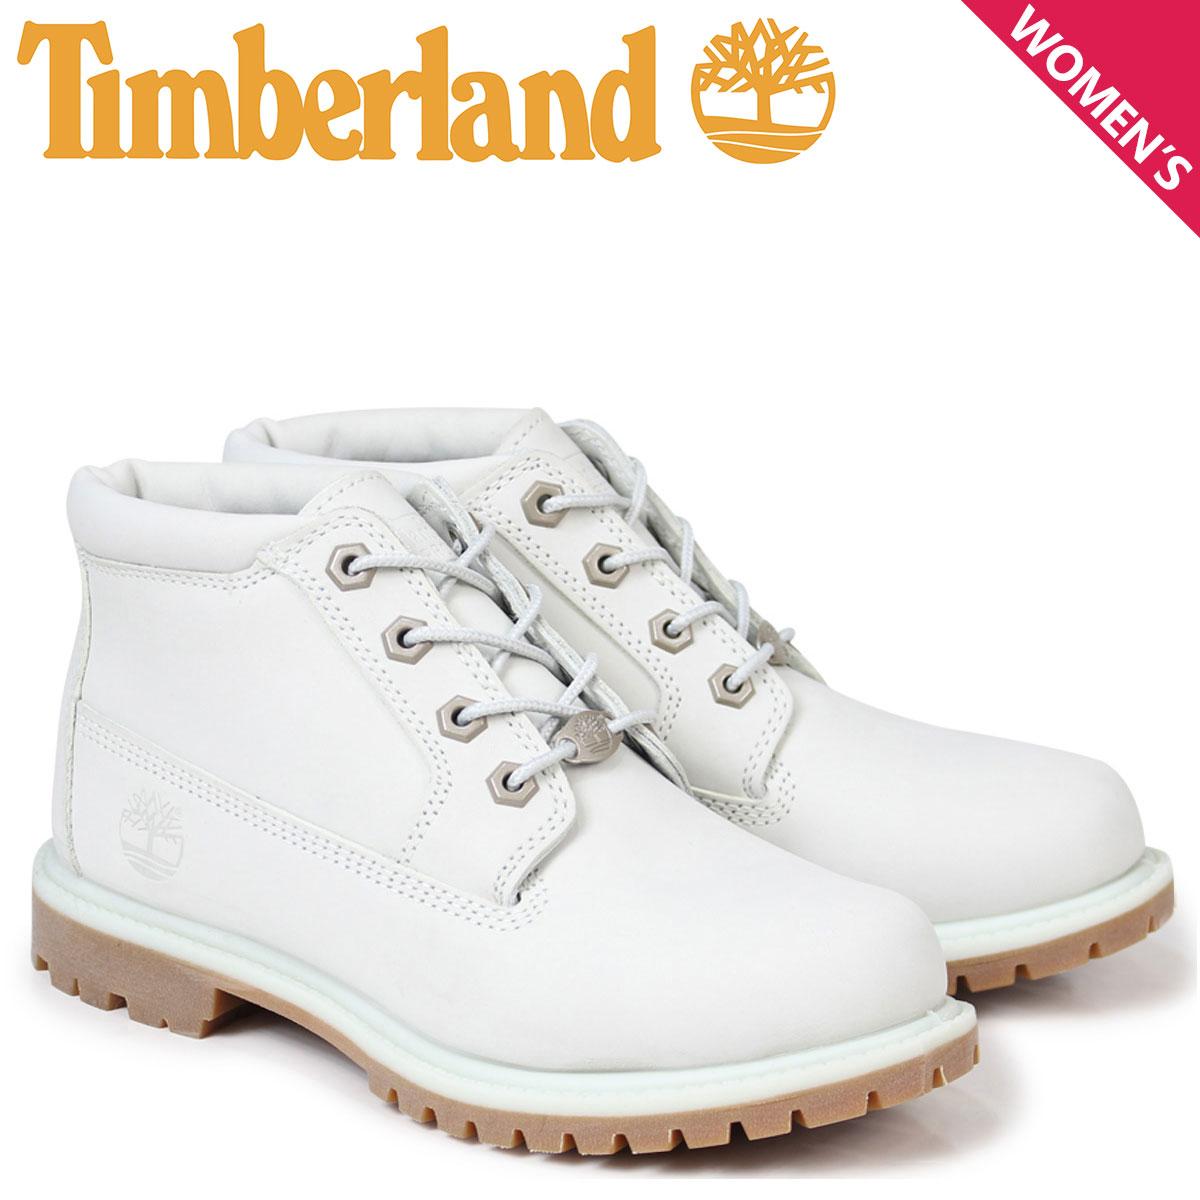 Timberland チャッカ レディース ティンバーランド ブーツ WOMEN'S NELLIE WATERPROOF CHUKKA BOOTS A1NDK Wワイズ ライトブルー